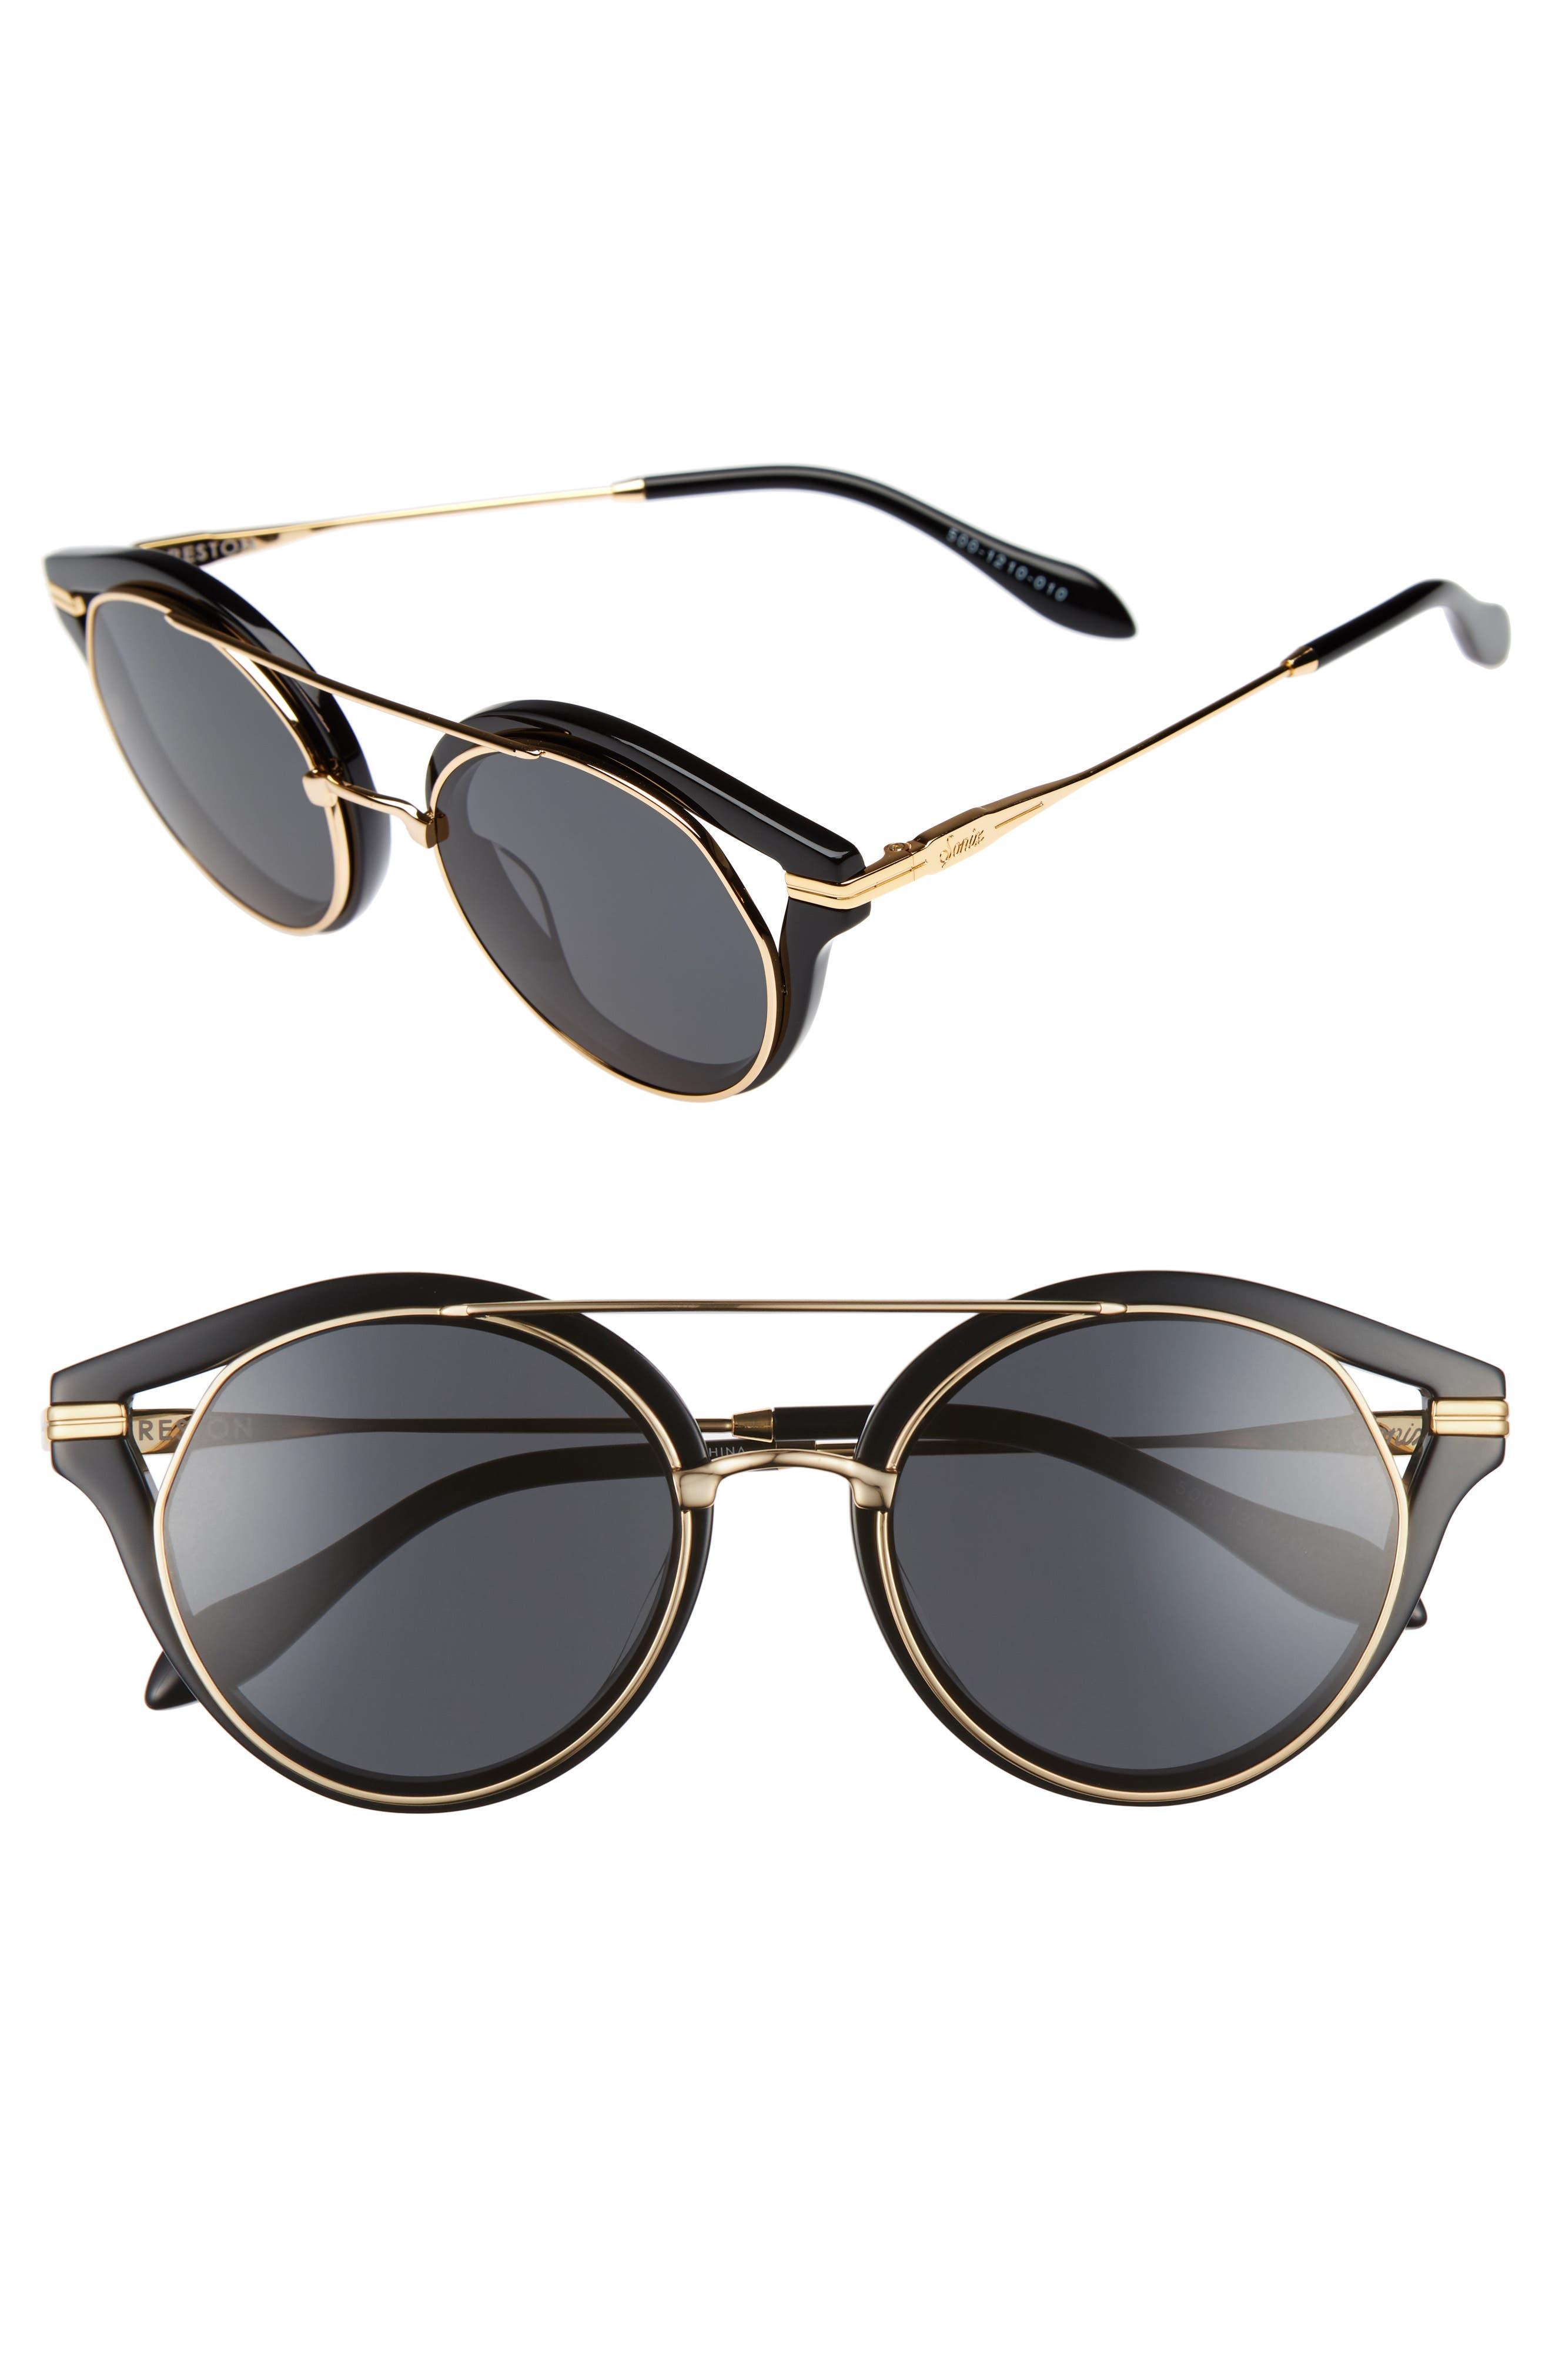 Sonix Preston 51mm Gradient Round Sunglasses